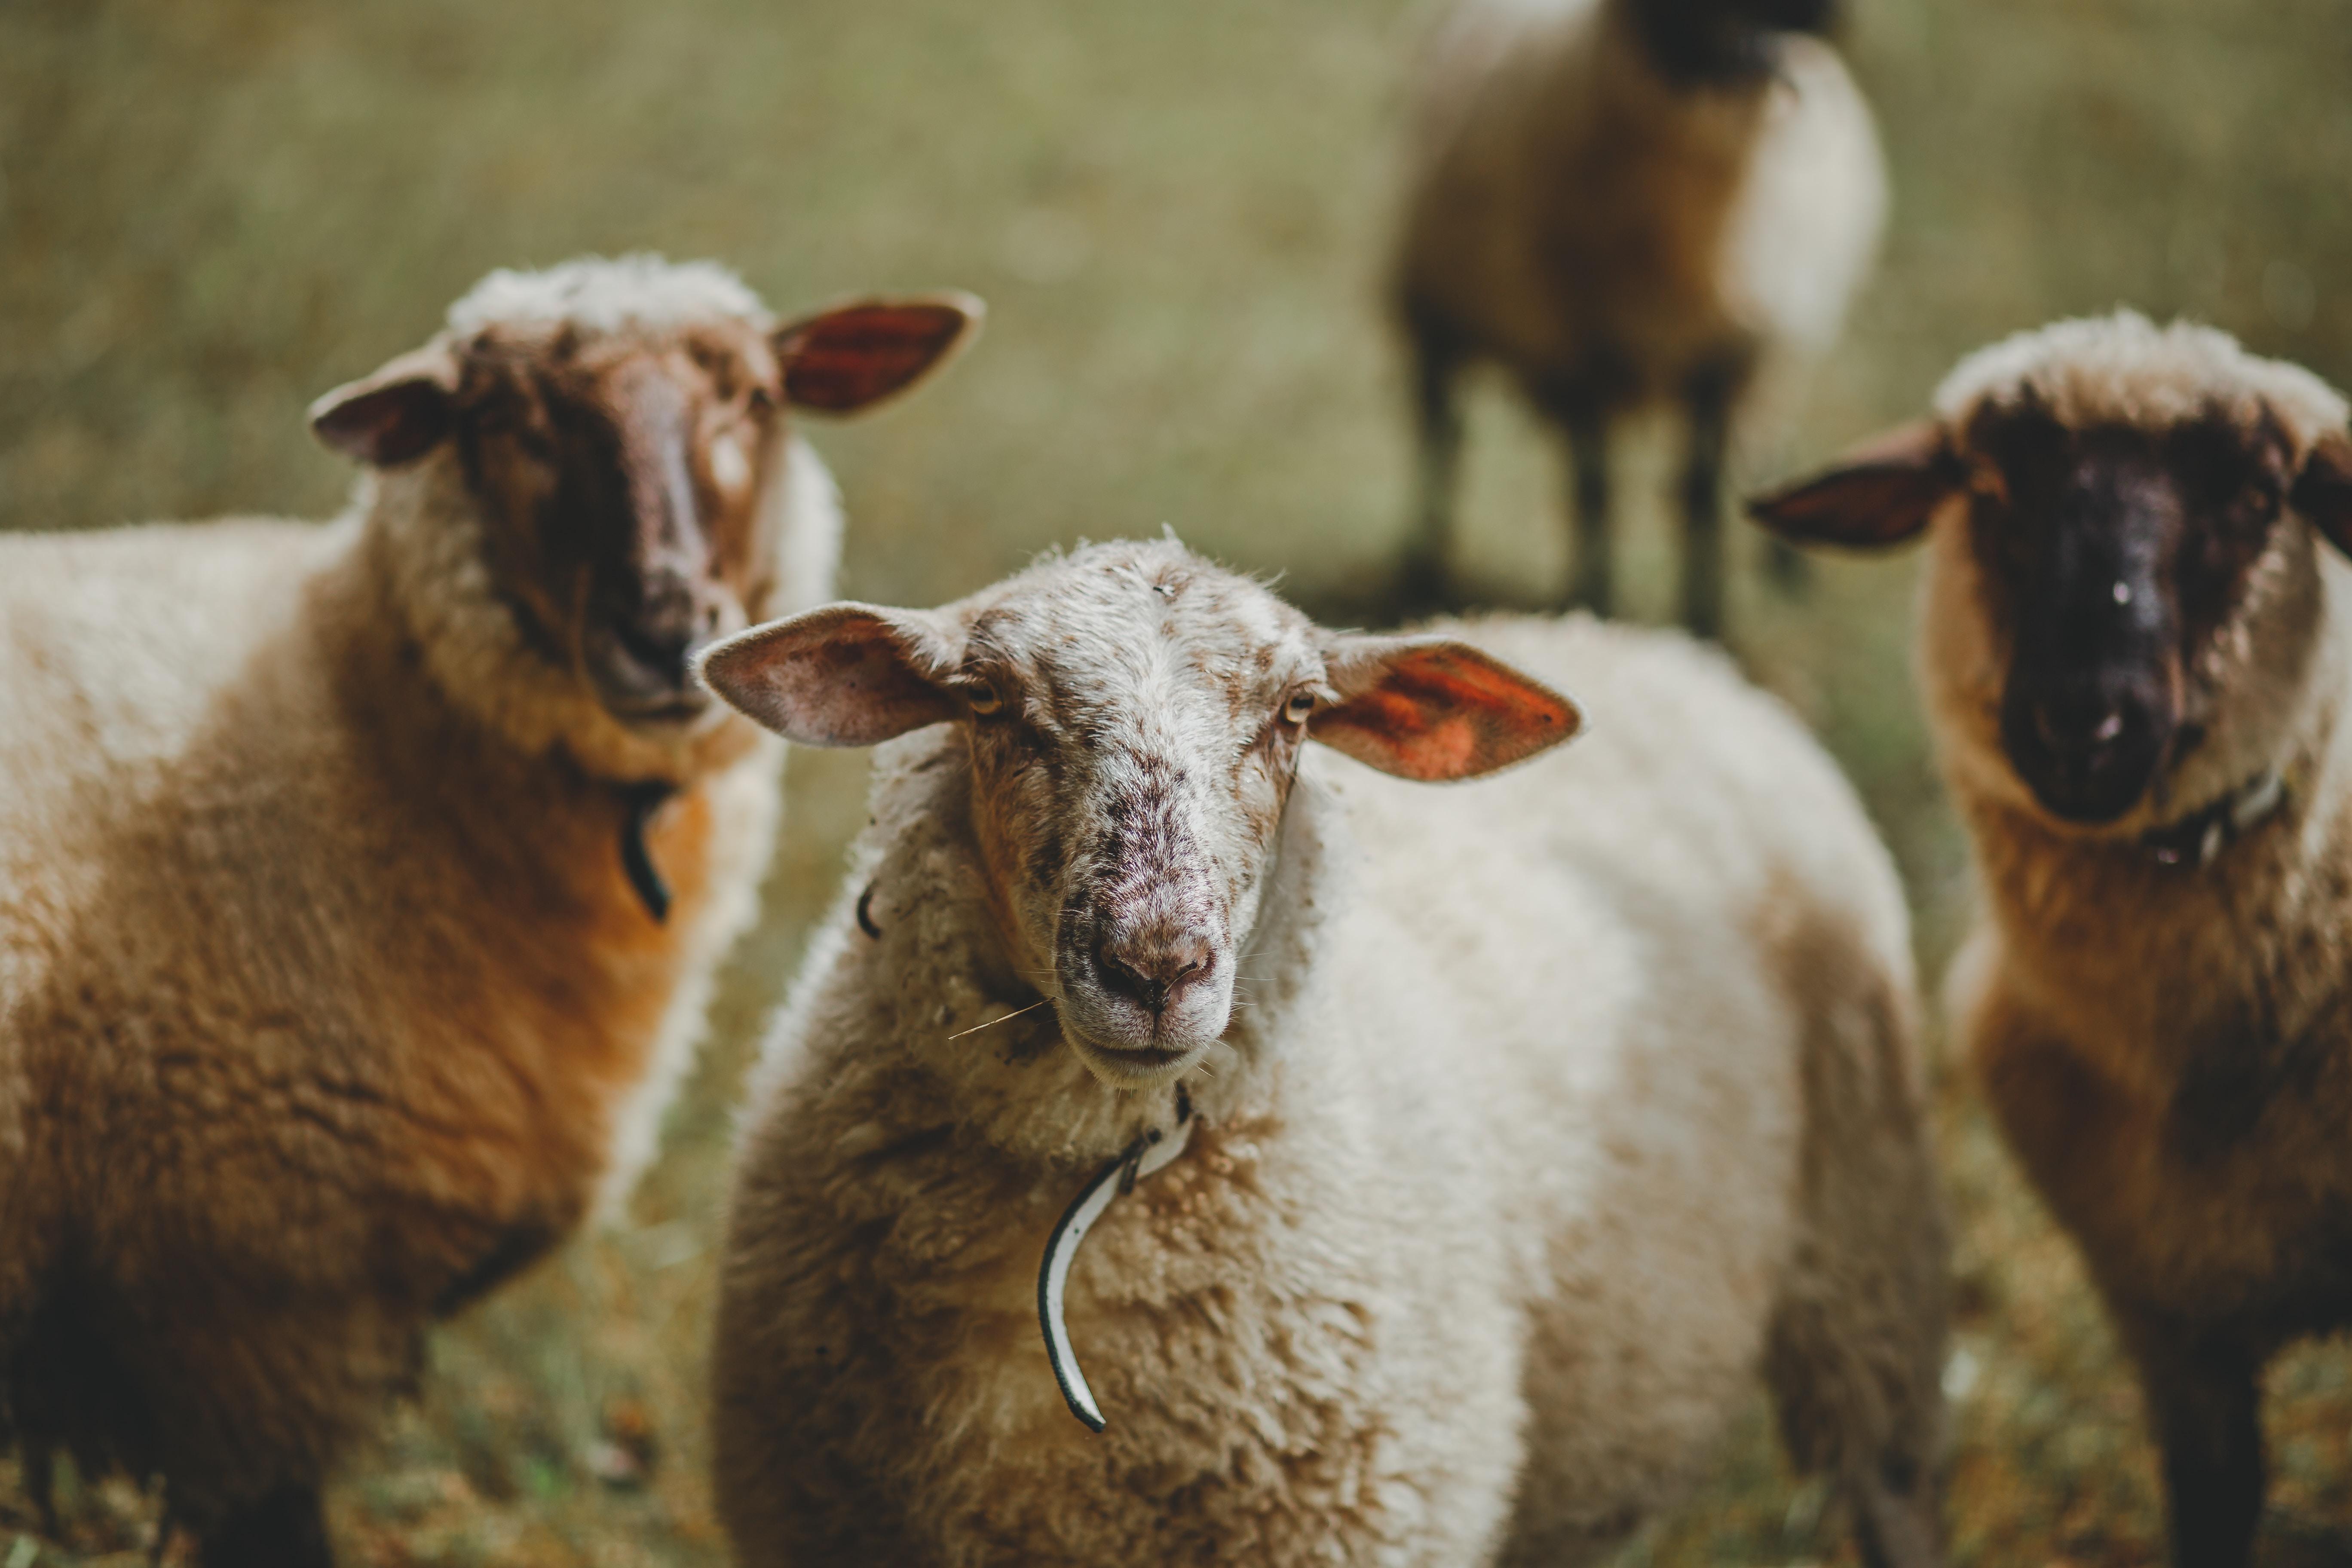 three white sheeps standing on grass field